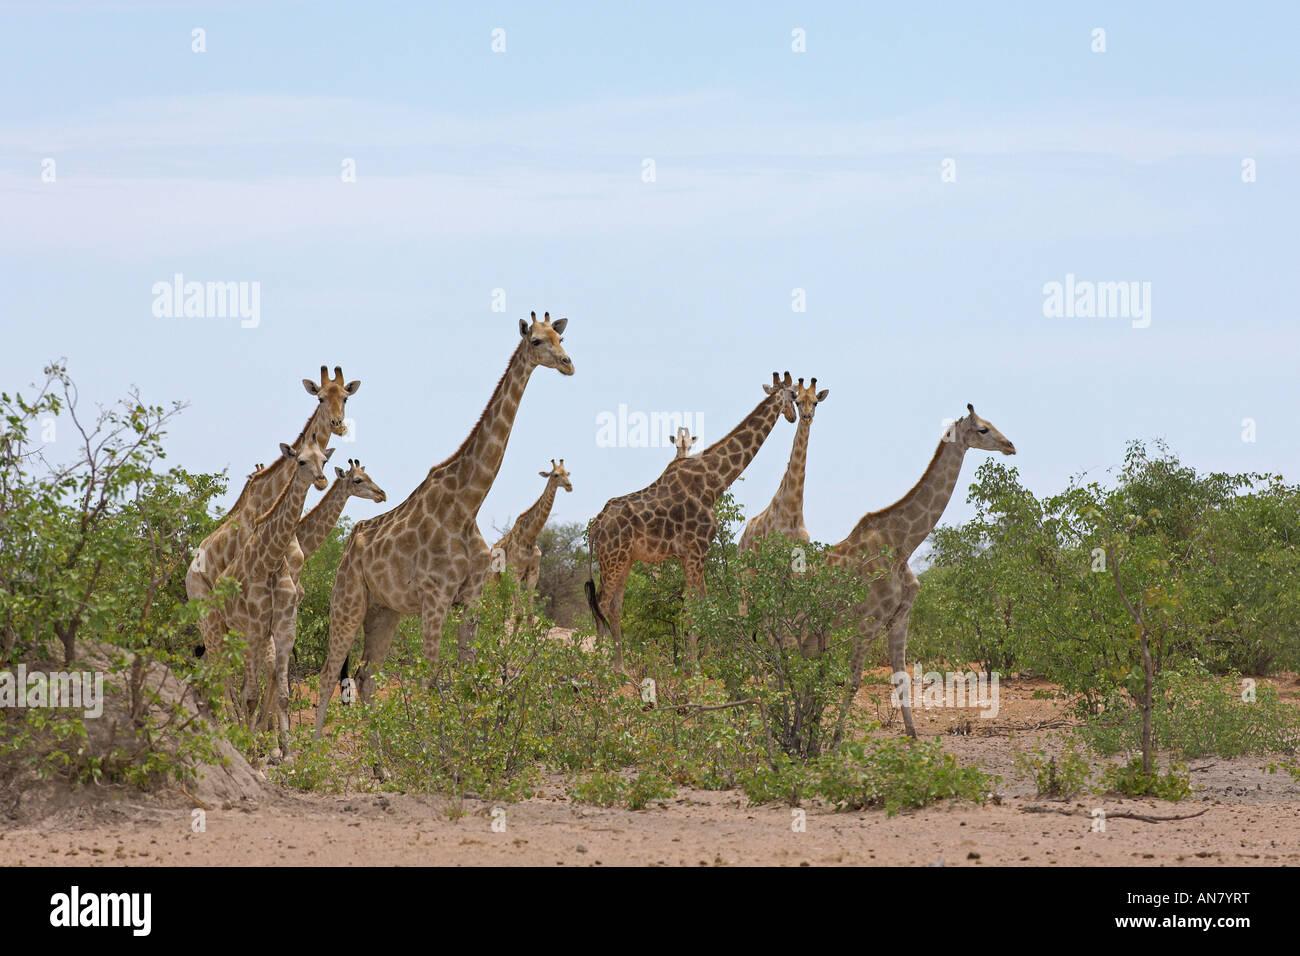 Southern giraffe Giraffa camelopardalis giraffa herd in mopane woodland Etosha National Park Namibia November - Stock Image